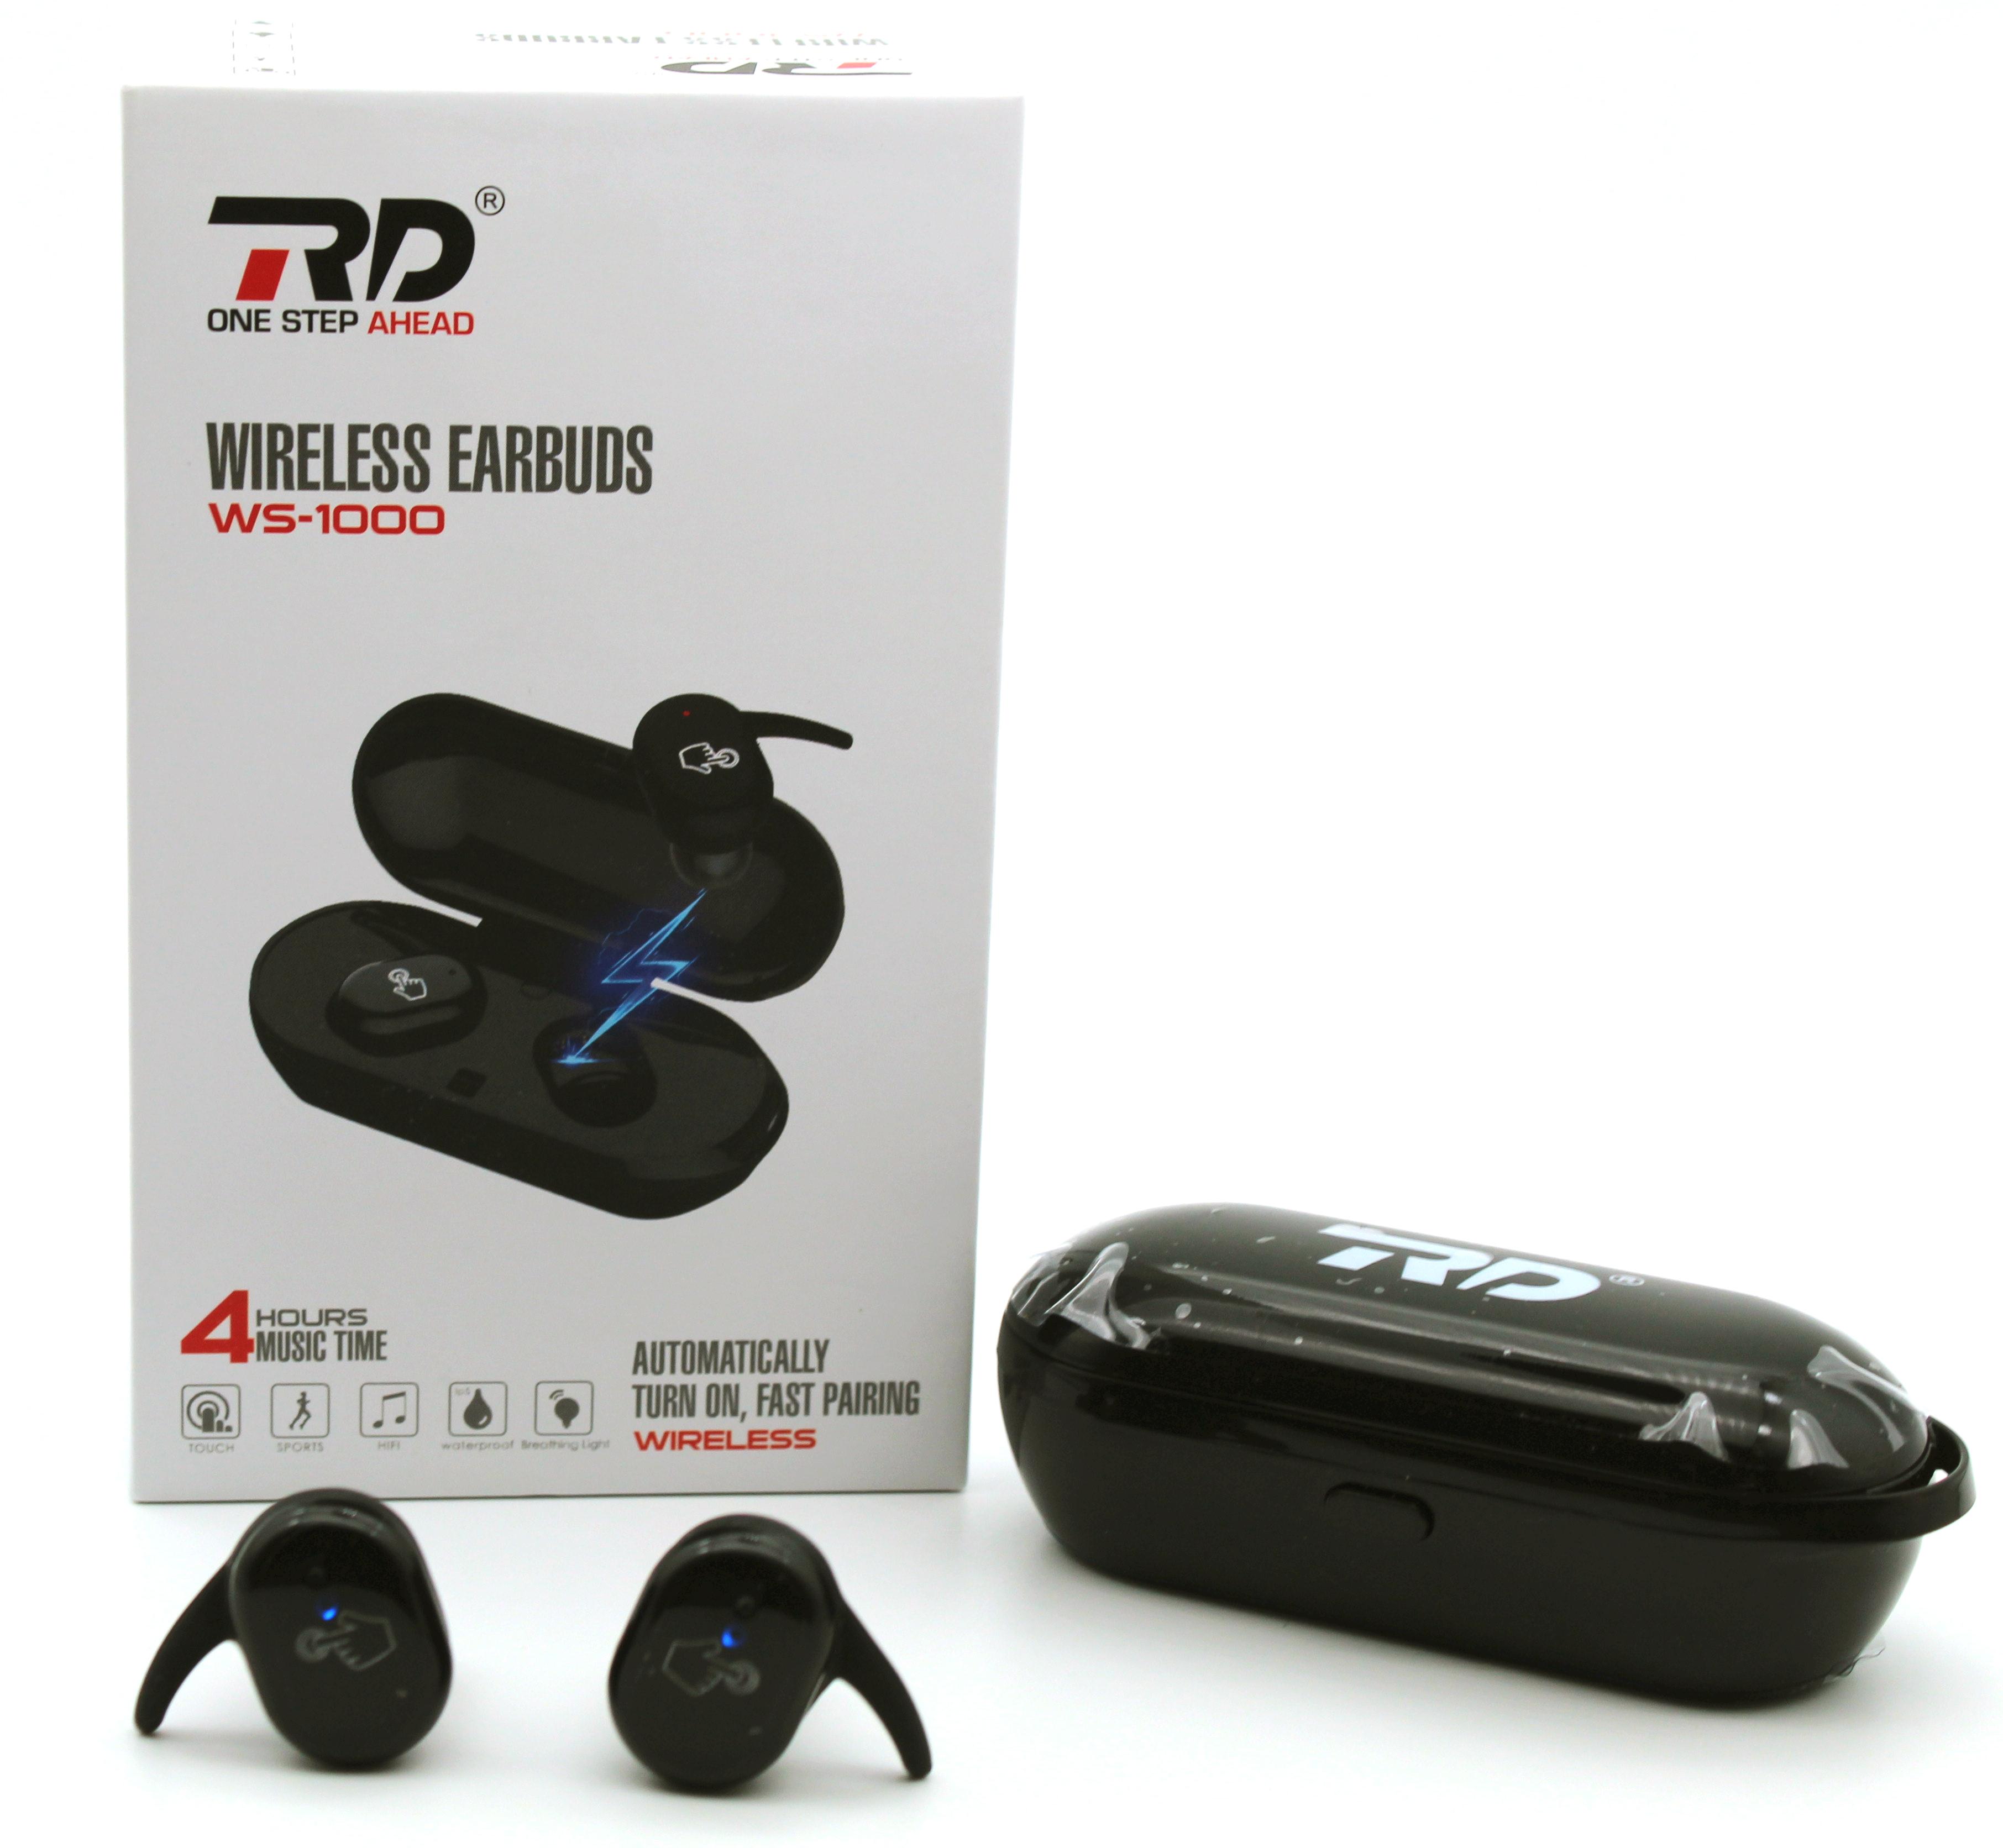 RD WS-1000 Wireless Earbuds